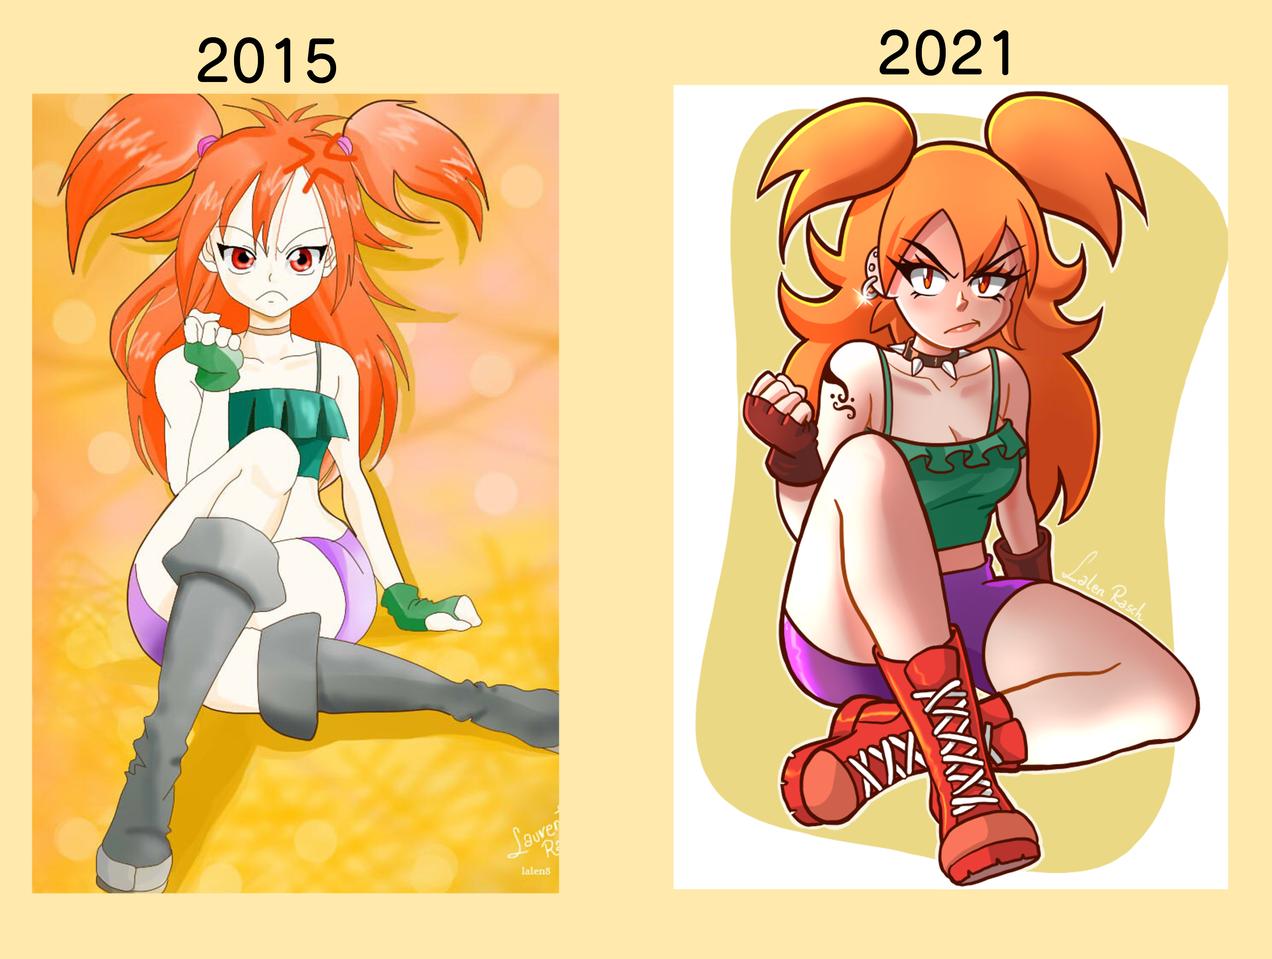 2015 vs 2016 Illust of LalenRasch Cristo es rey! digital girl drawthisagainchallen animestyle animegirl illustration DrawThisAgain illustrations